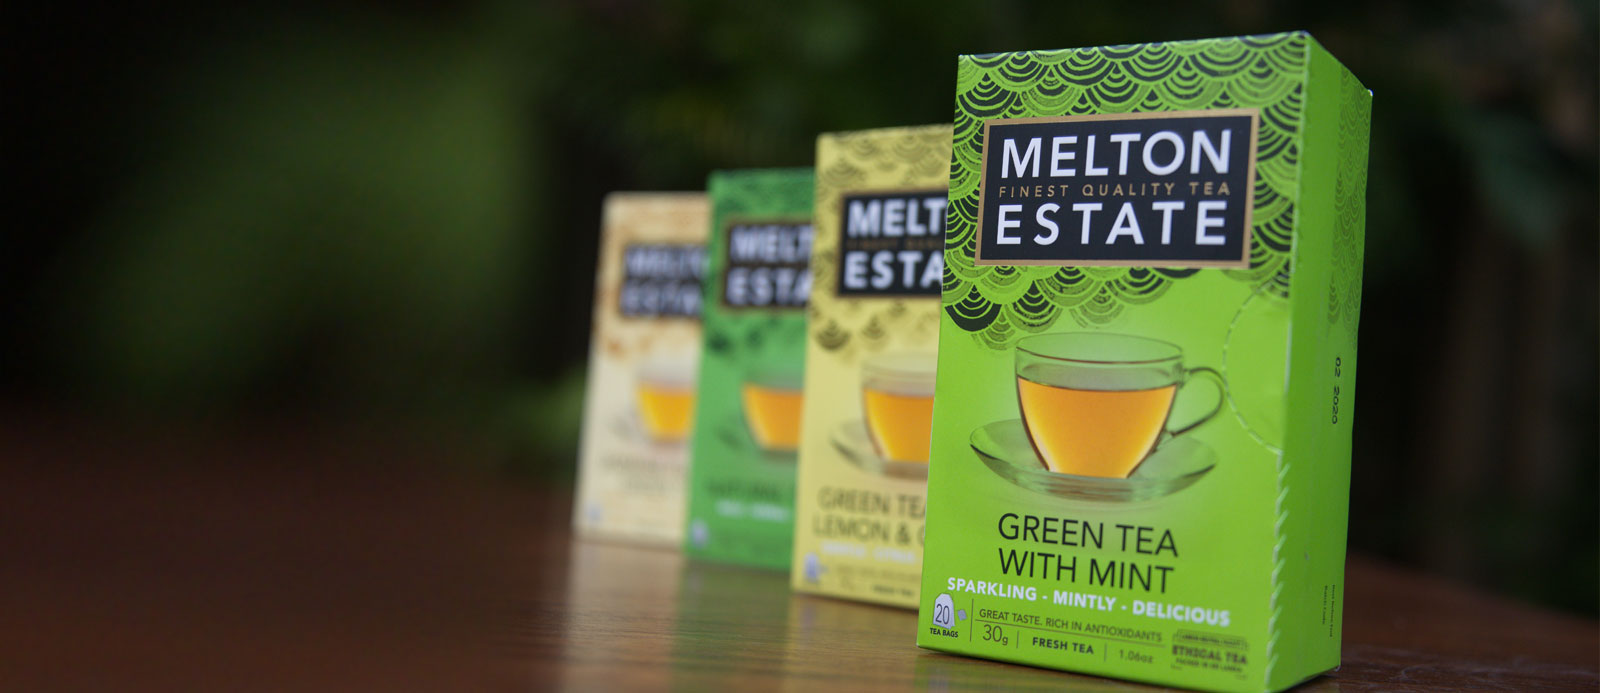 Melton Estate - Finest Quality Tea